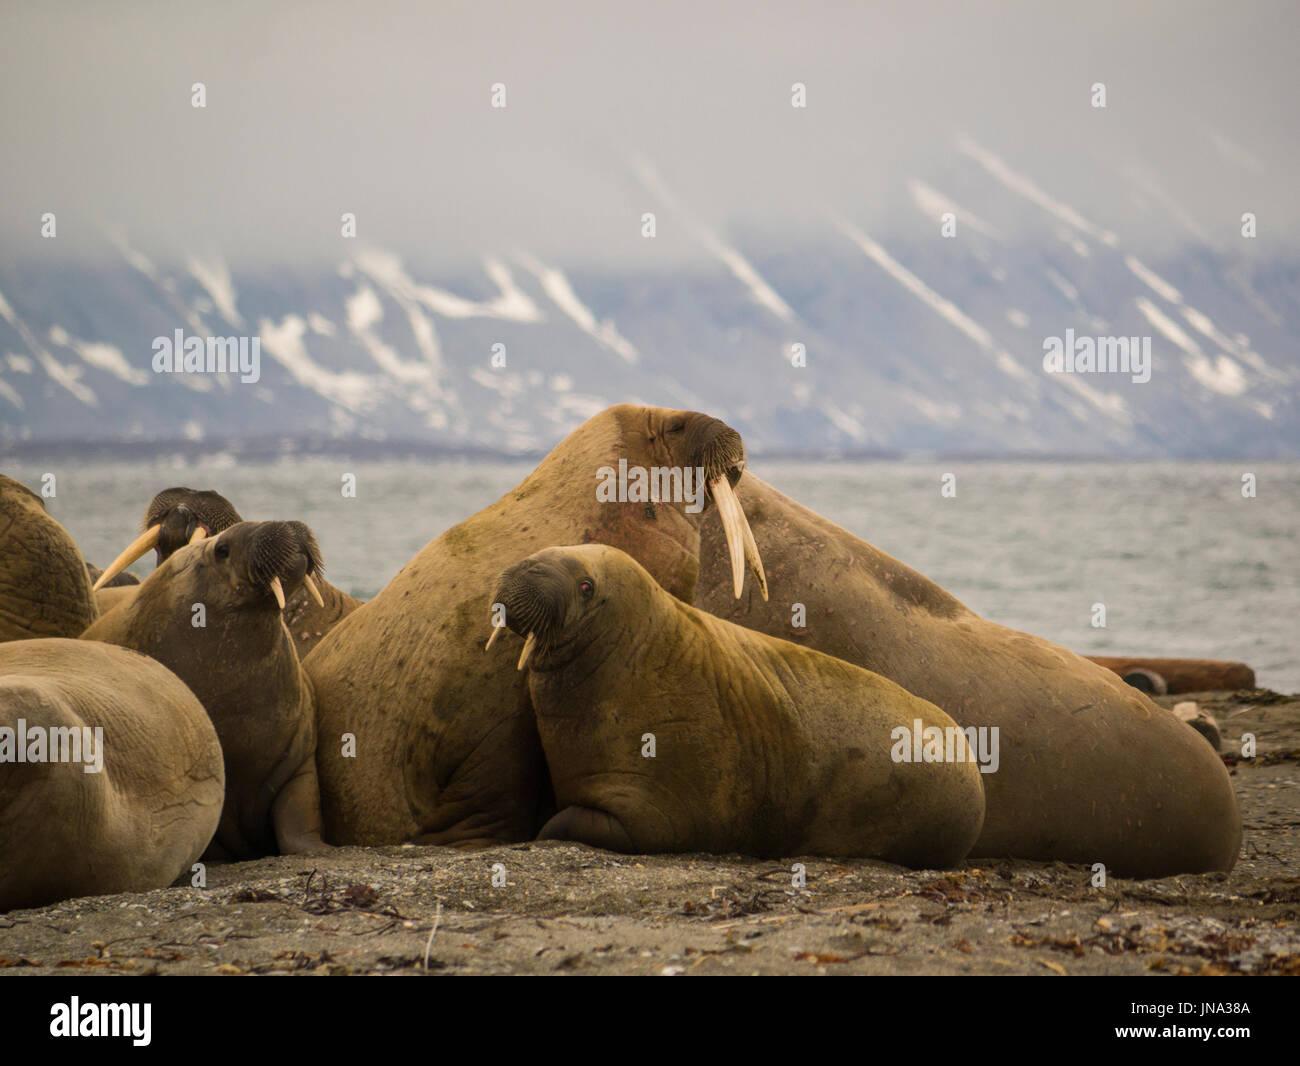 Digesting Imágenes De Stock & Digesting Fotos De Stock - Alamy